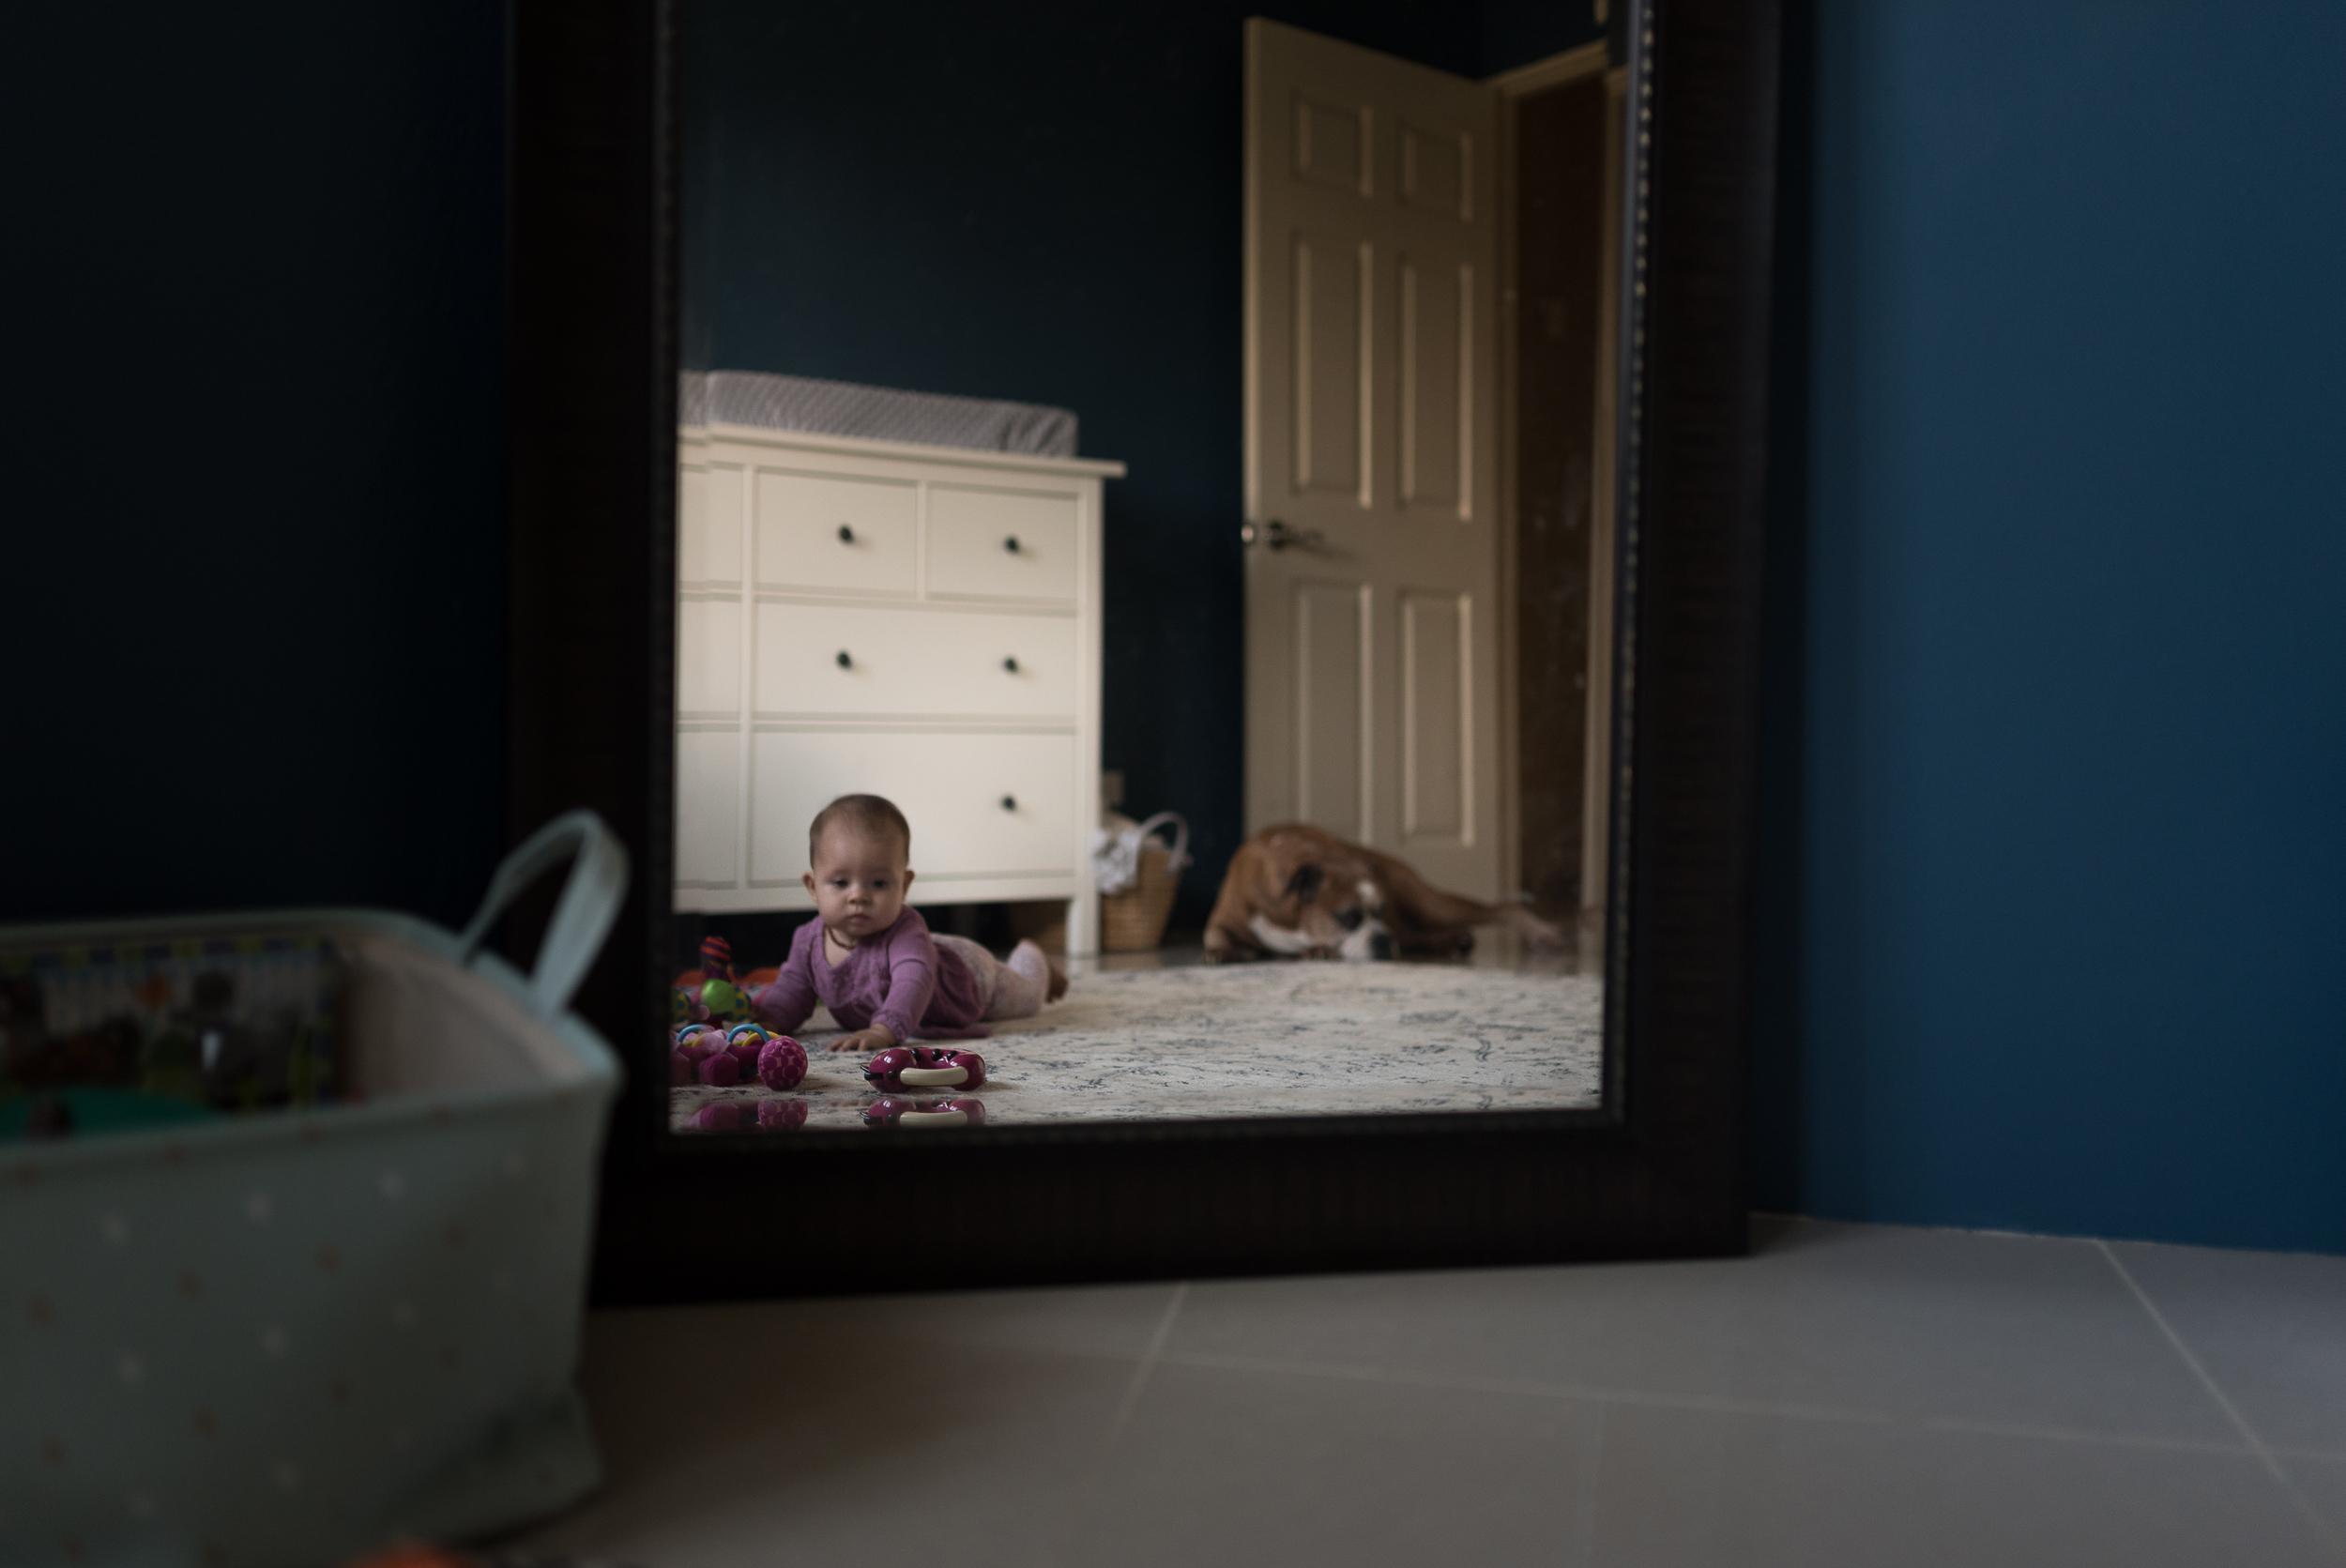 baby-year-one-motherhood-roxanne-augusta-guam-photography-14.jpg